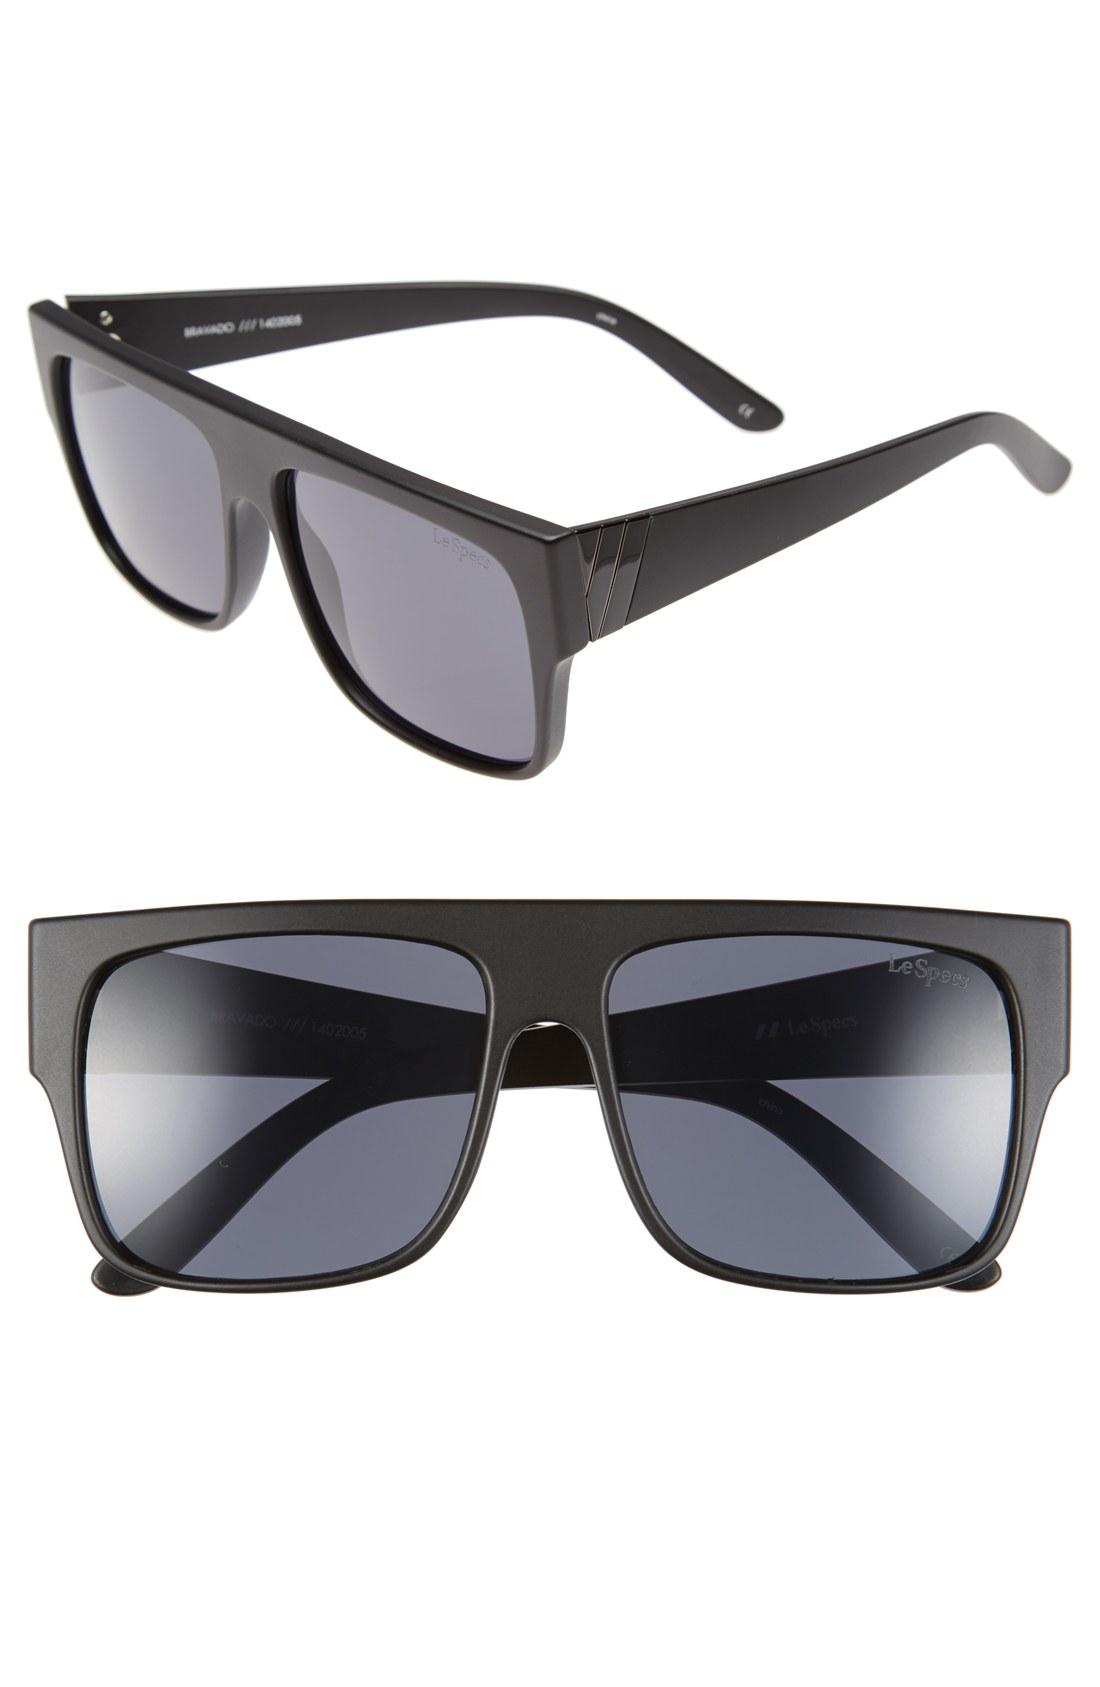 c3b7abc4d7 Le Specs  Bravado  59mm Retro Sunglasses